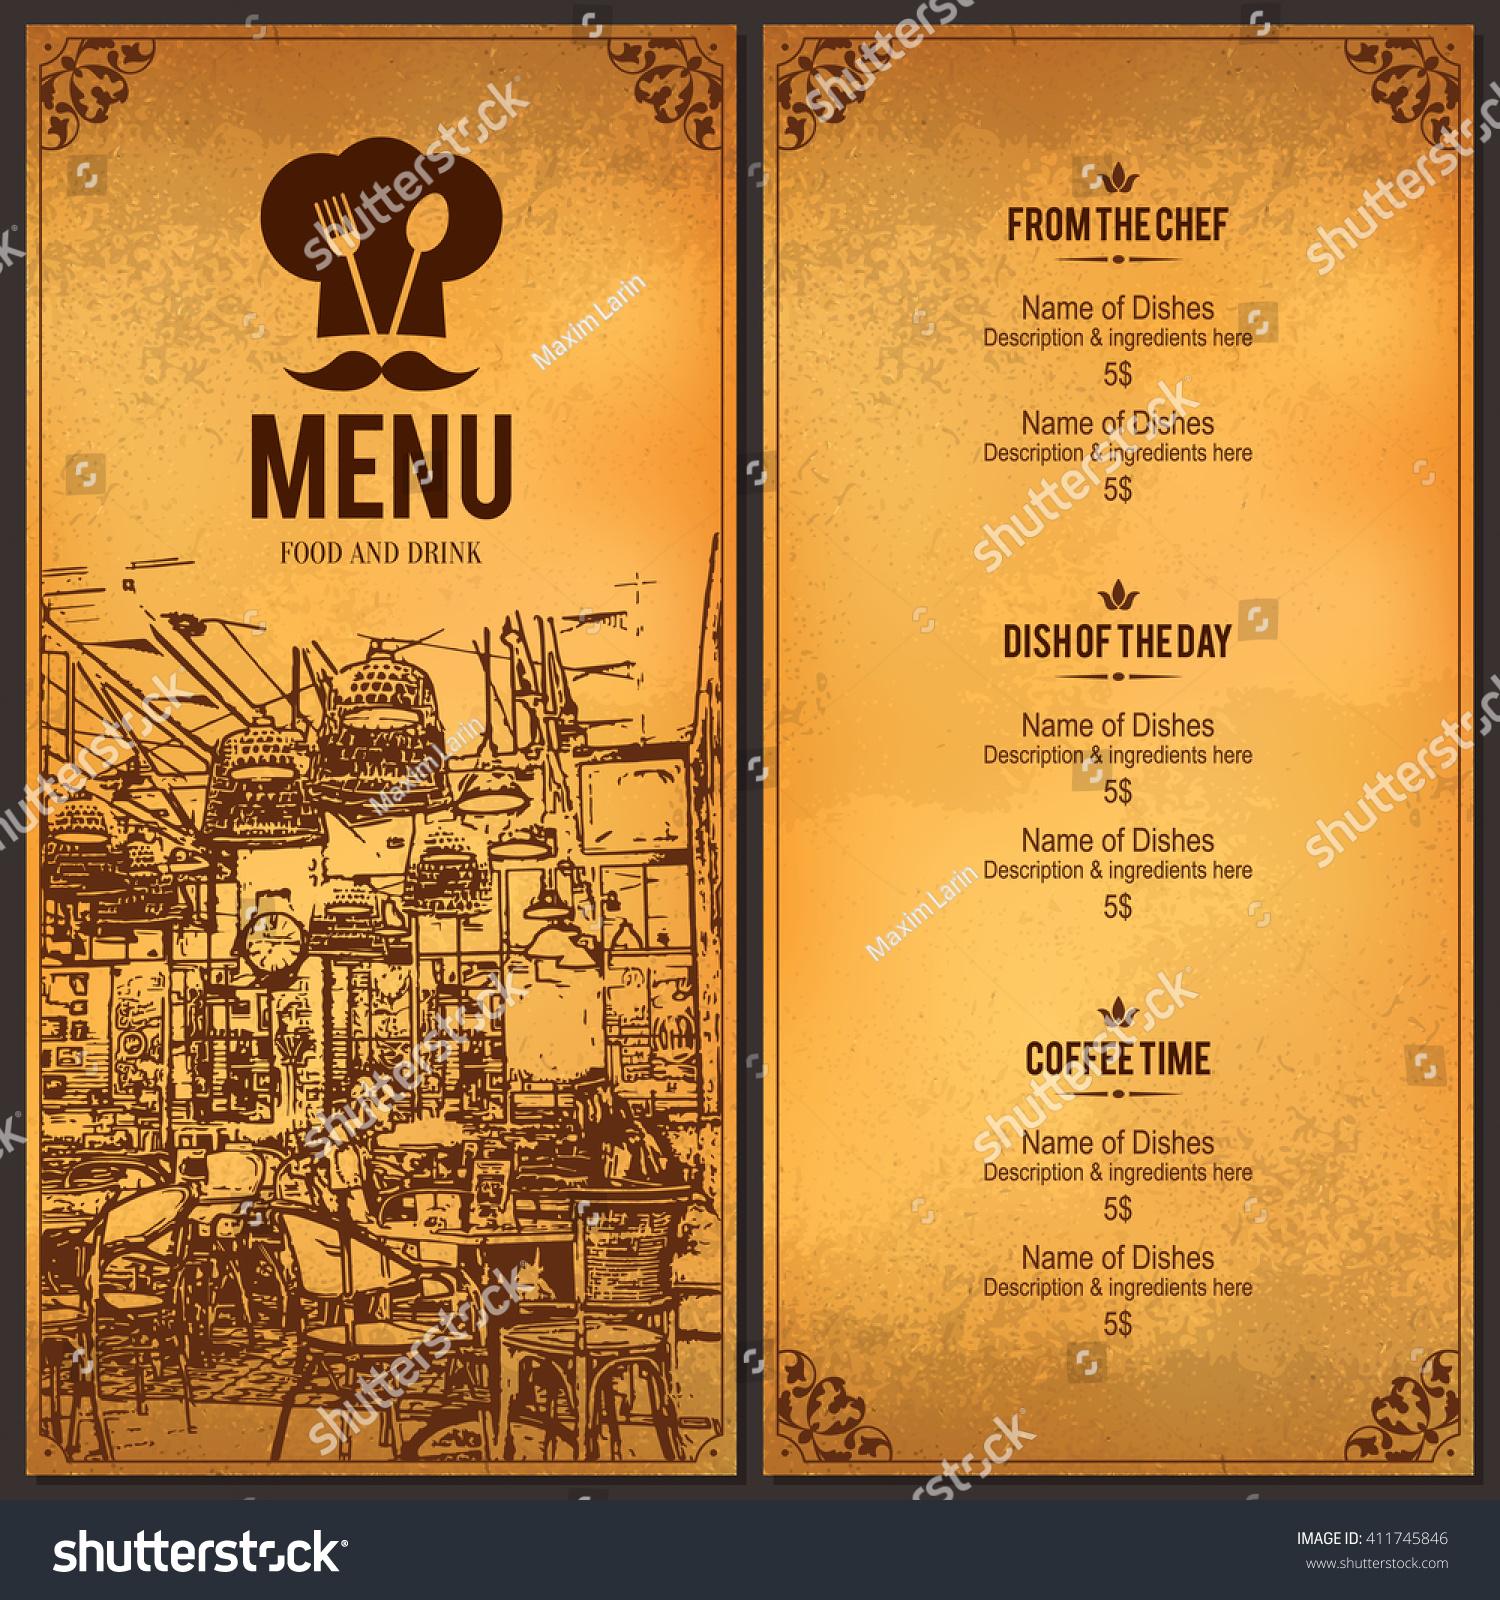 Restaurant Menu Design Vector Menu Brochure Stock Vector ...